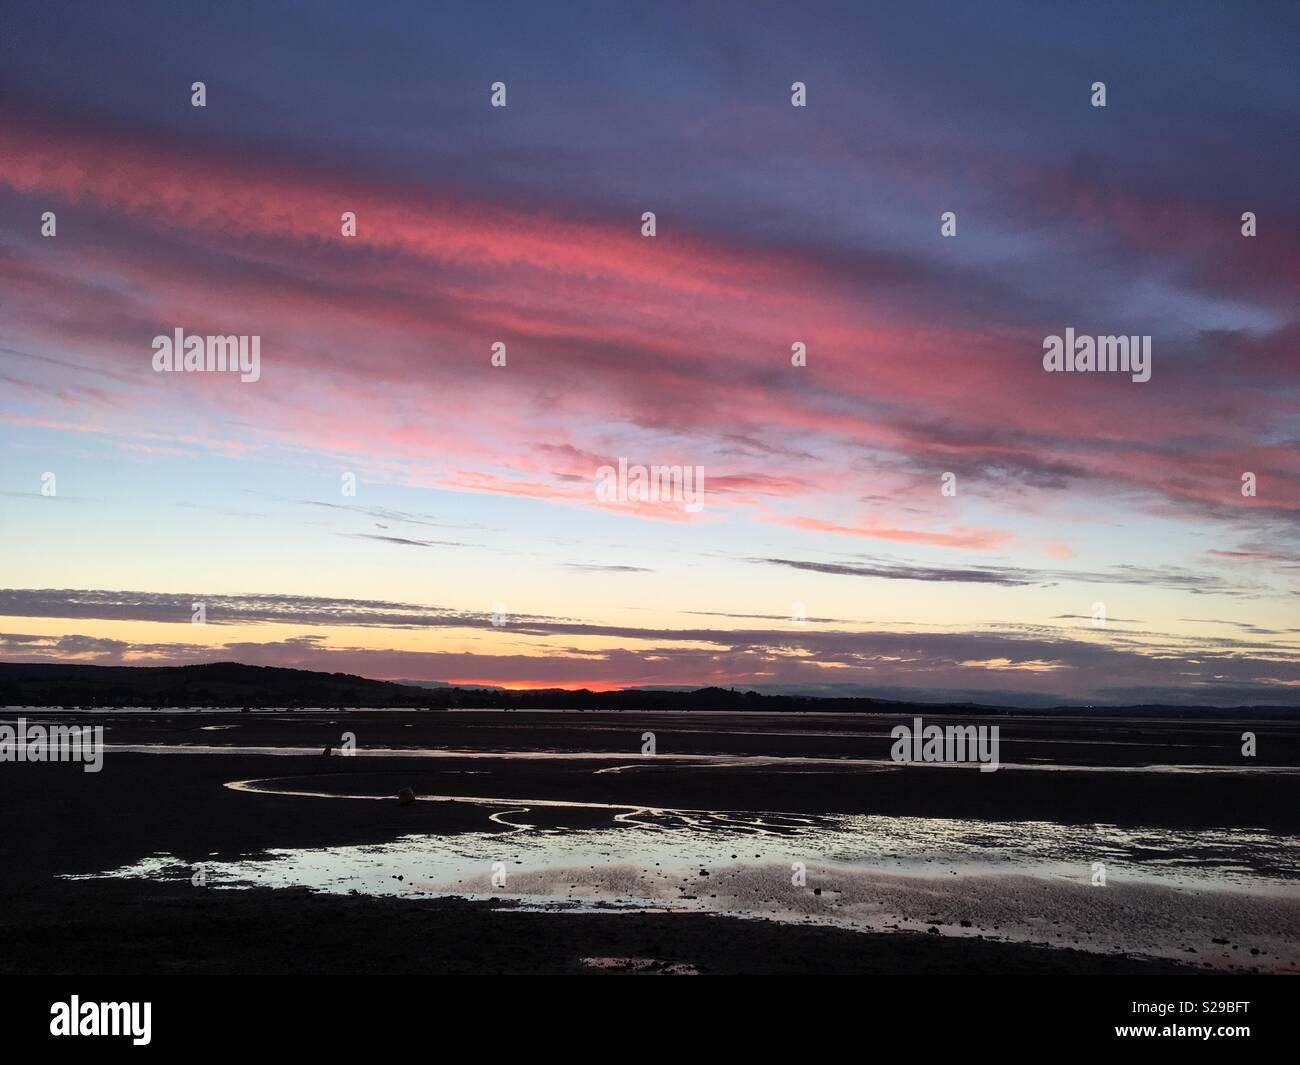 Exe Estuary at sunset - Stock Image